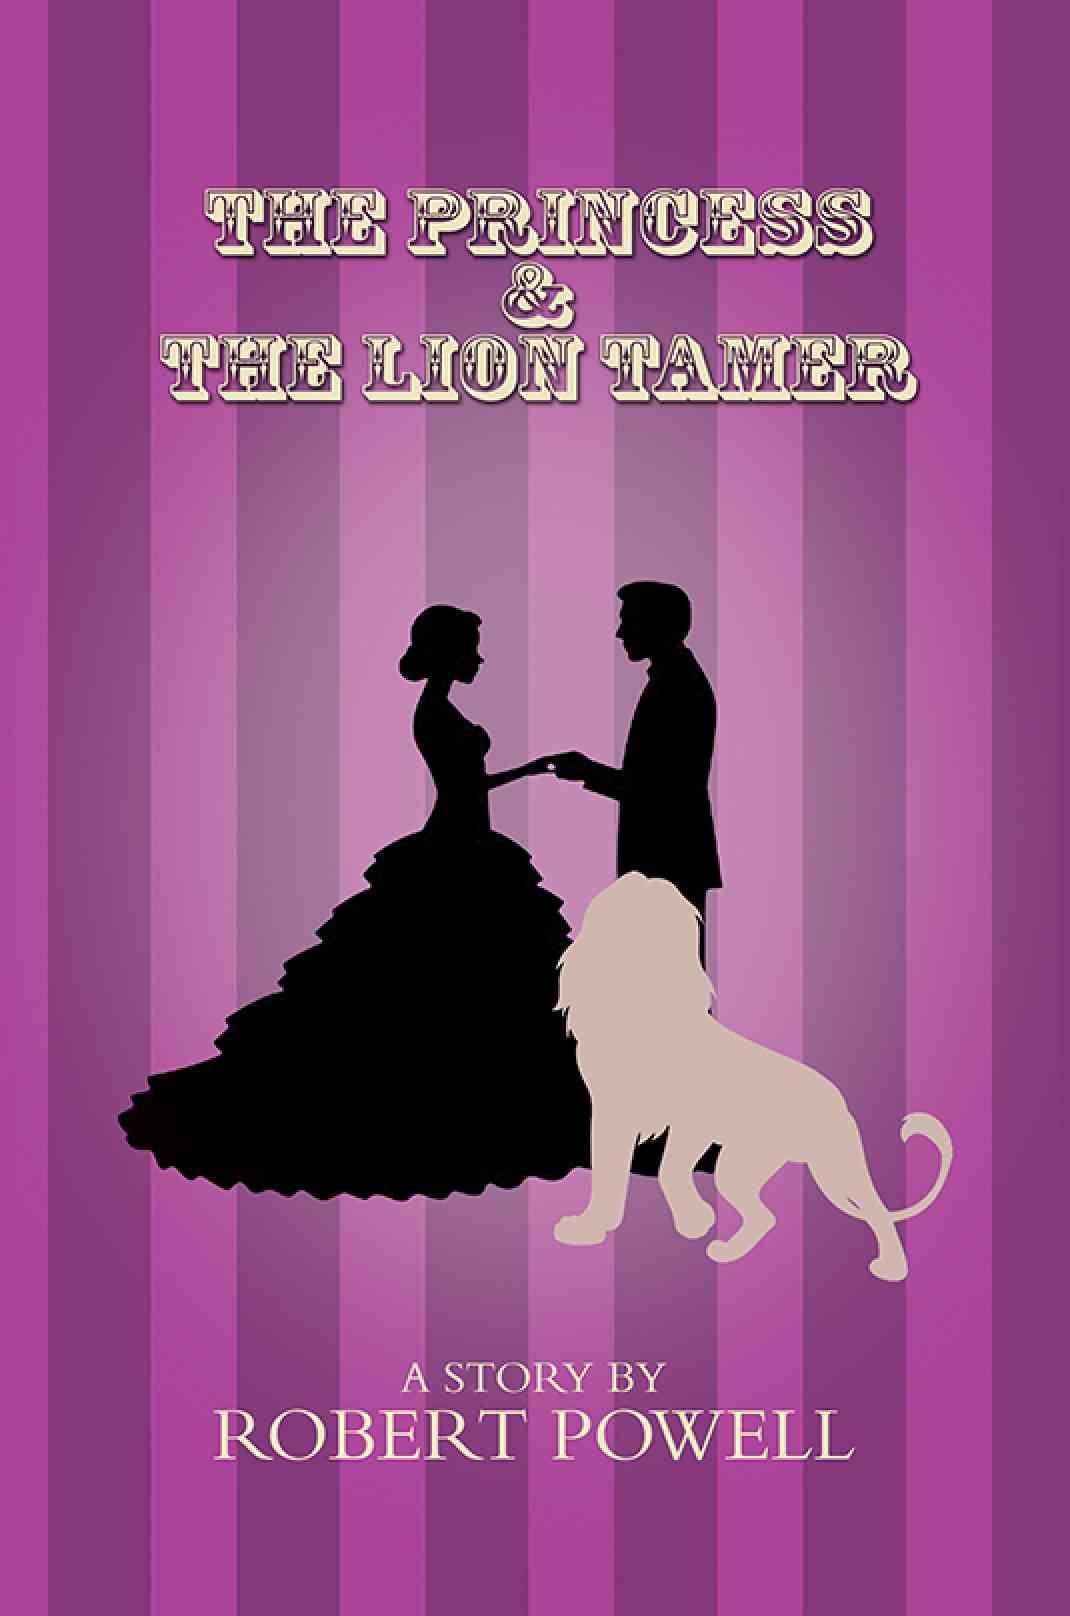 The Princess & The Lion Tamer